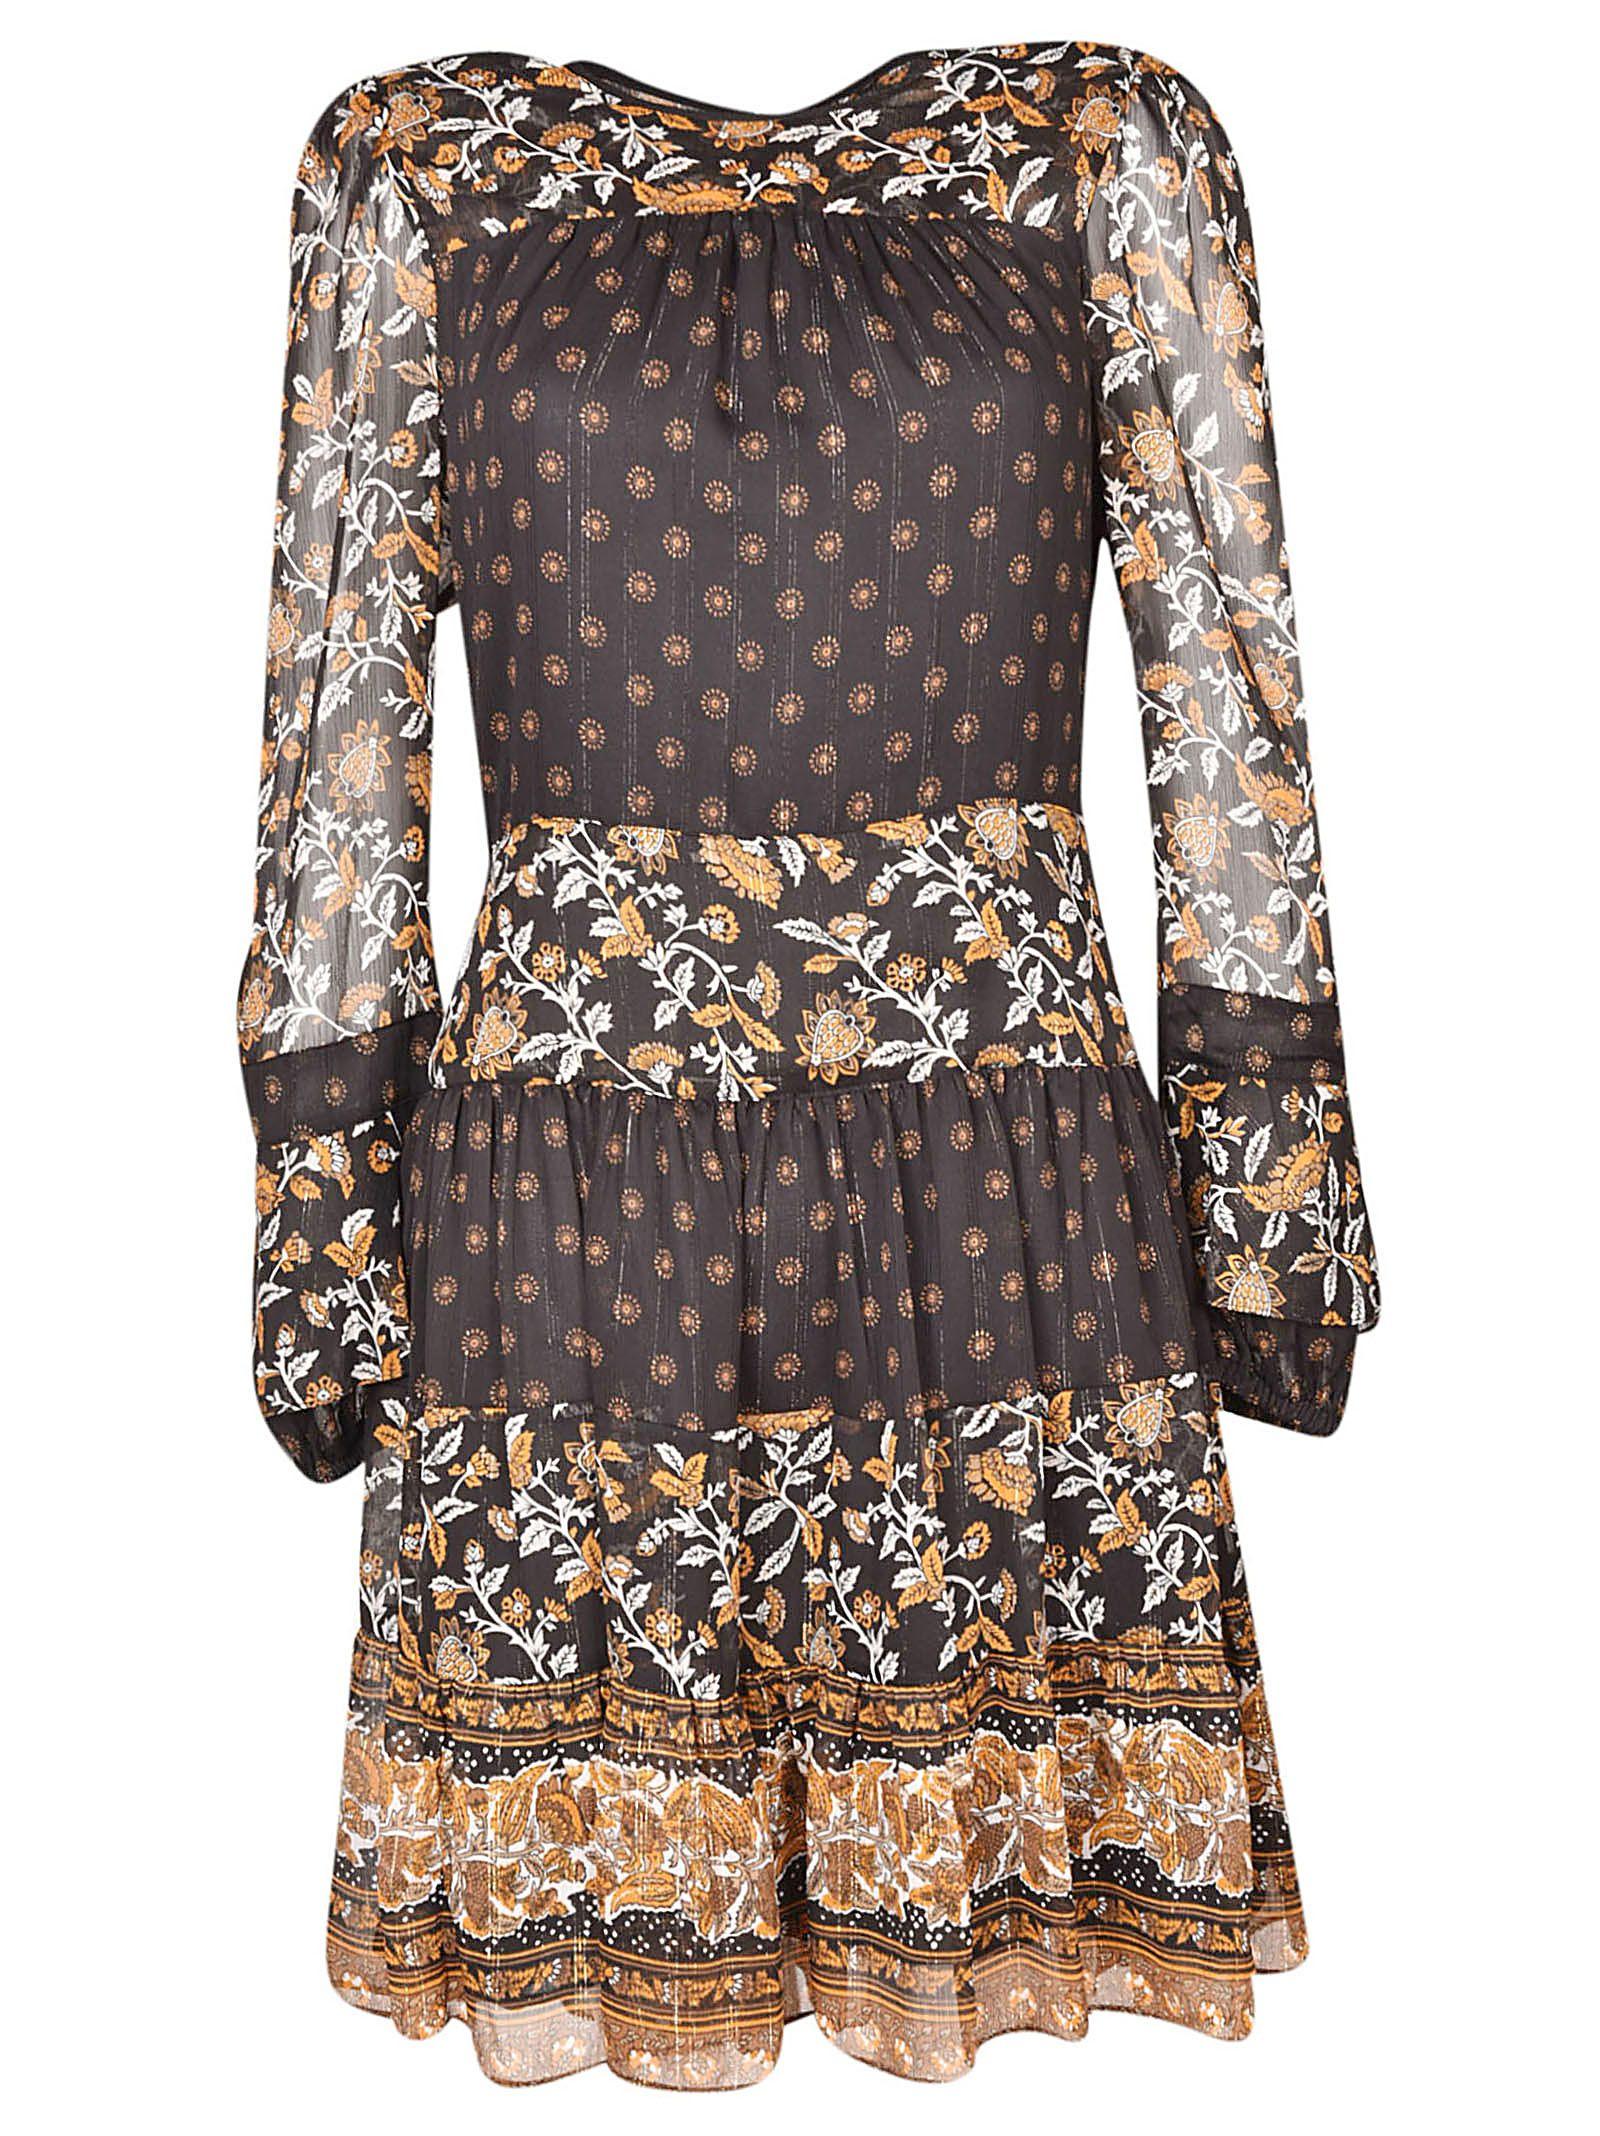 Border Woven Dress, 795.Black/Marigold